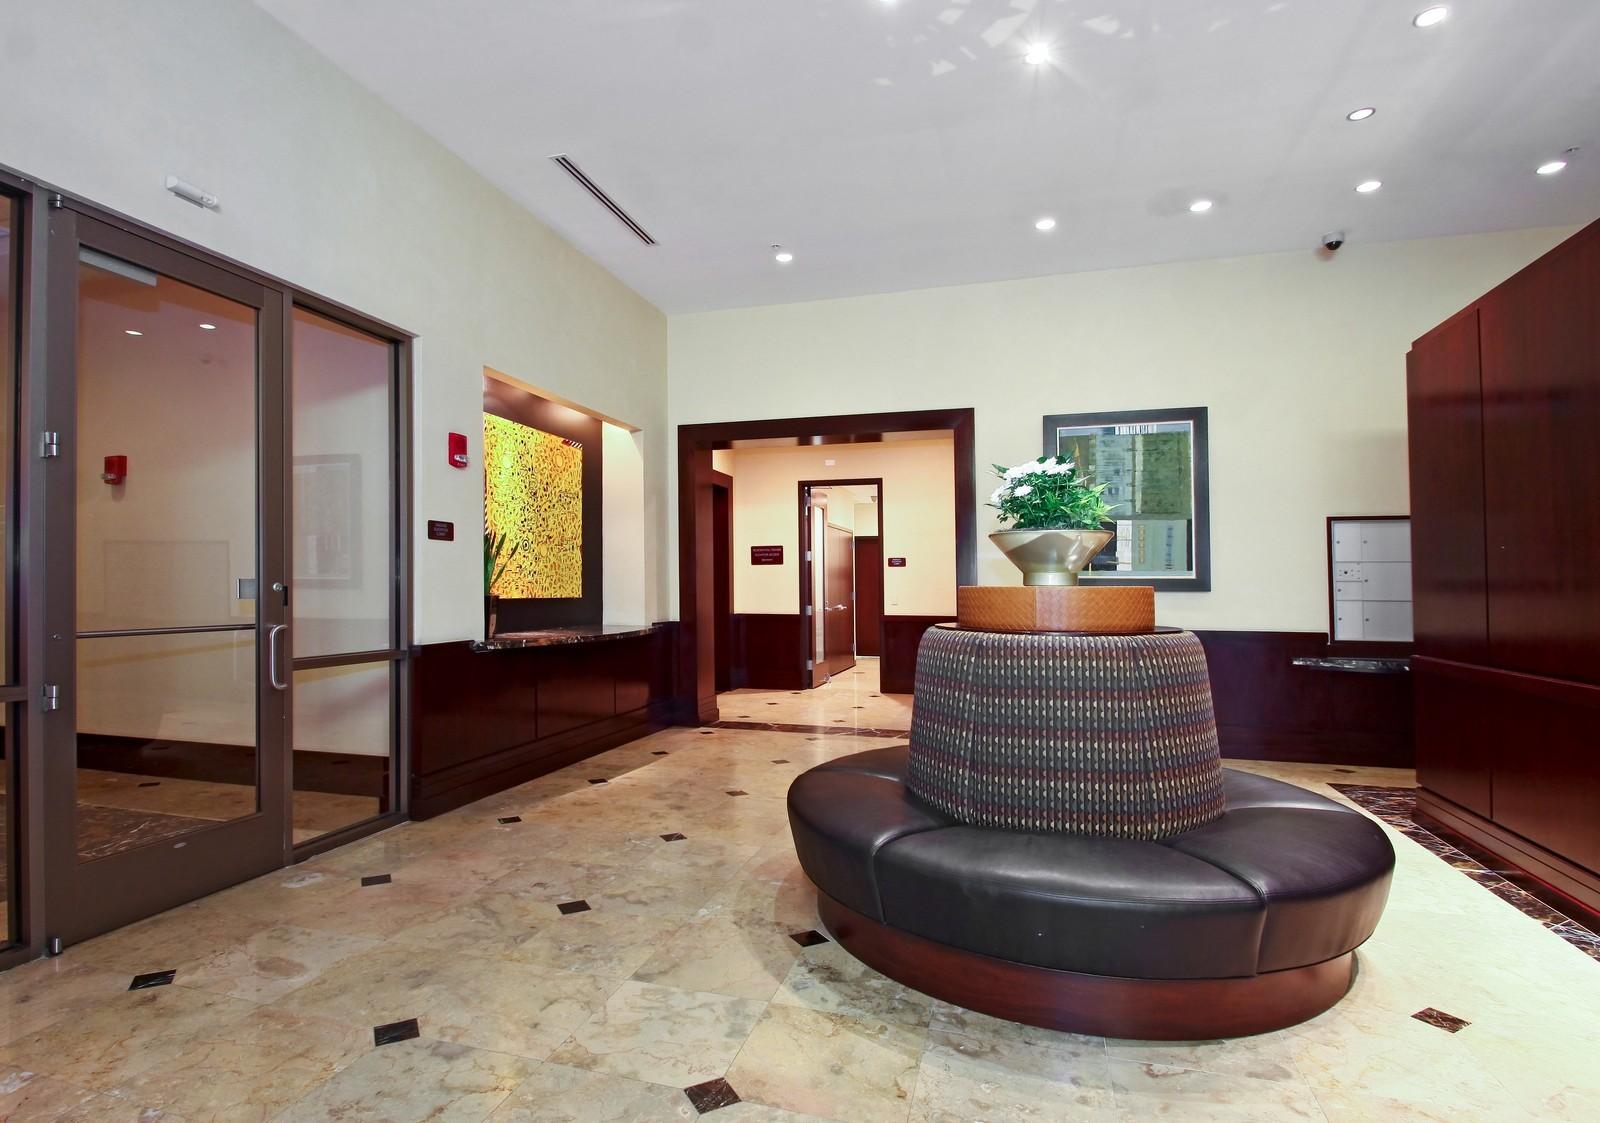 Real Estate Photography - 807 Davis, Evanston, IL, 60201 - Lobby